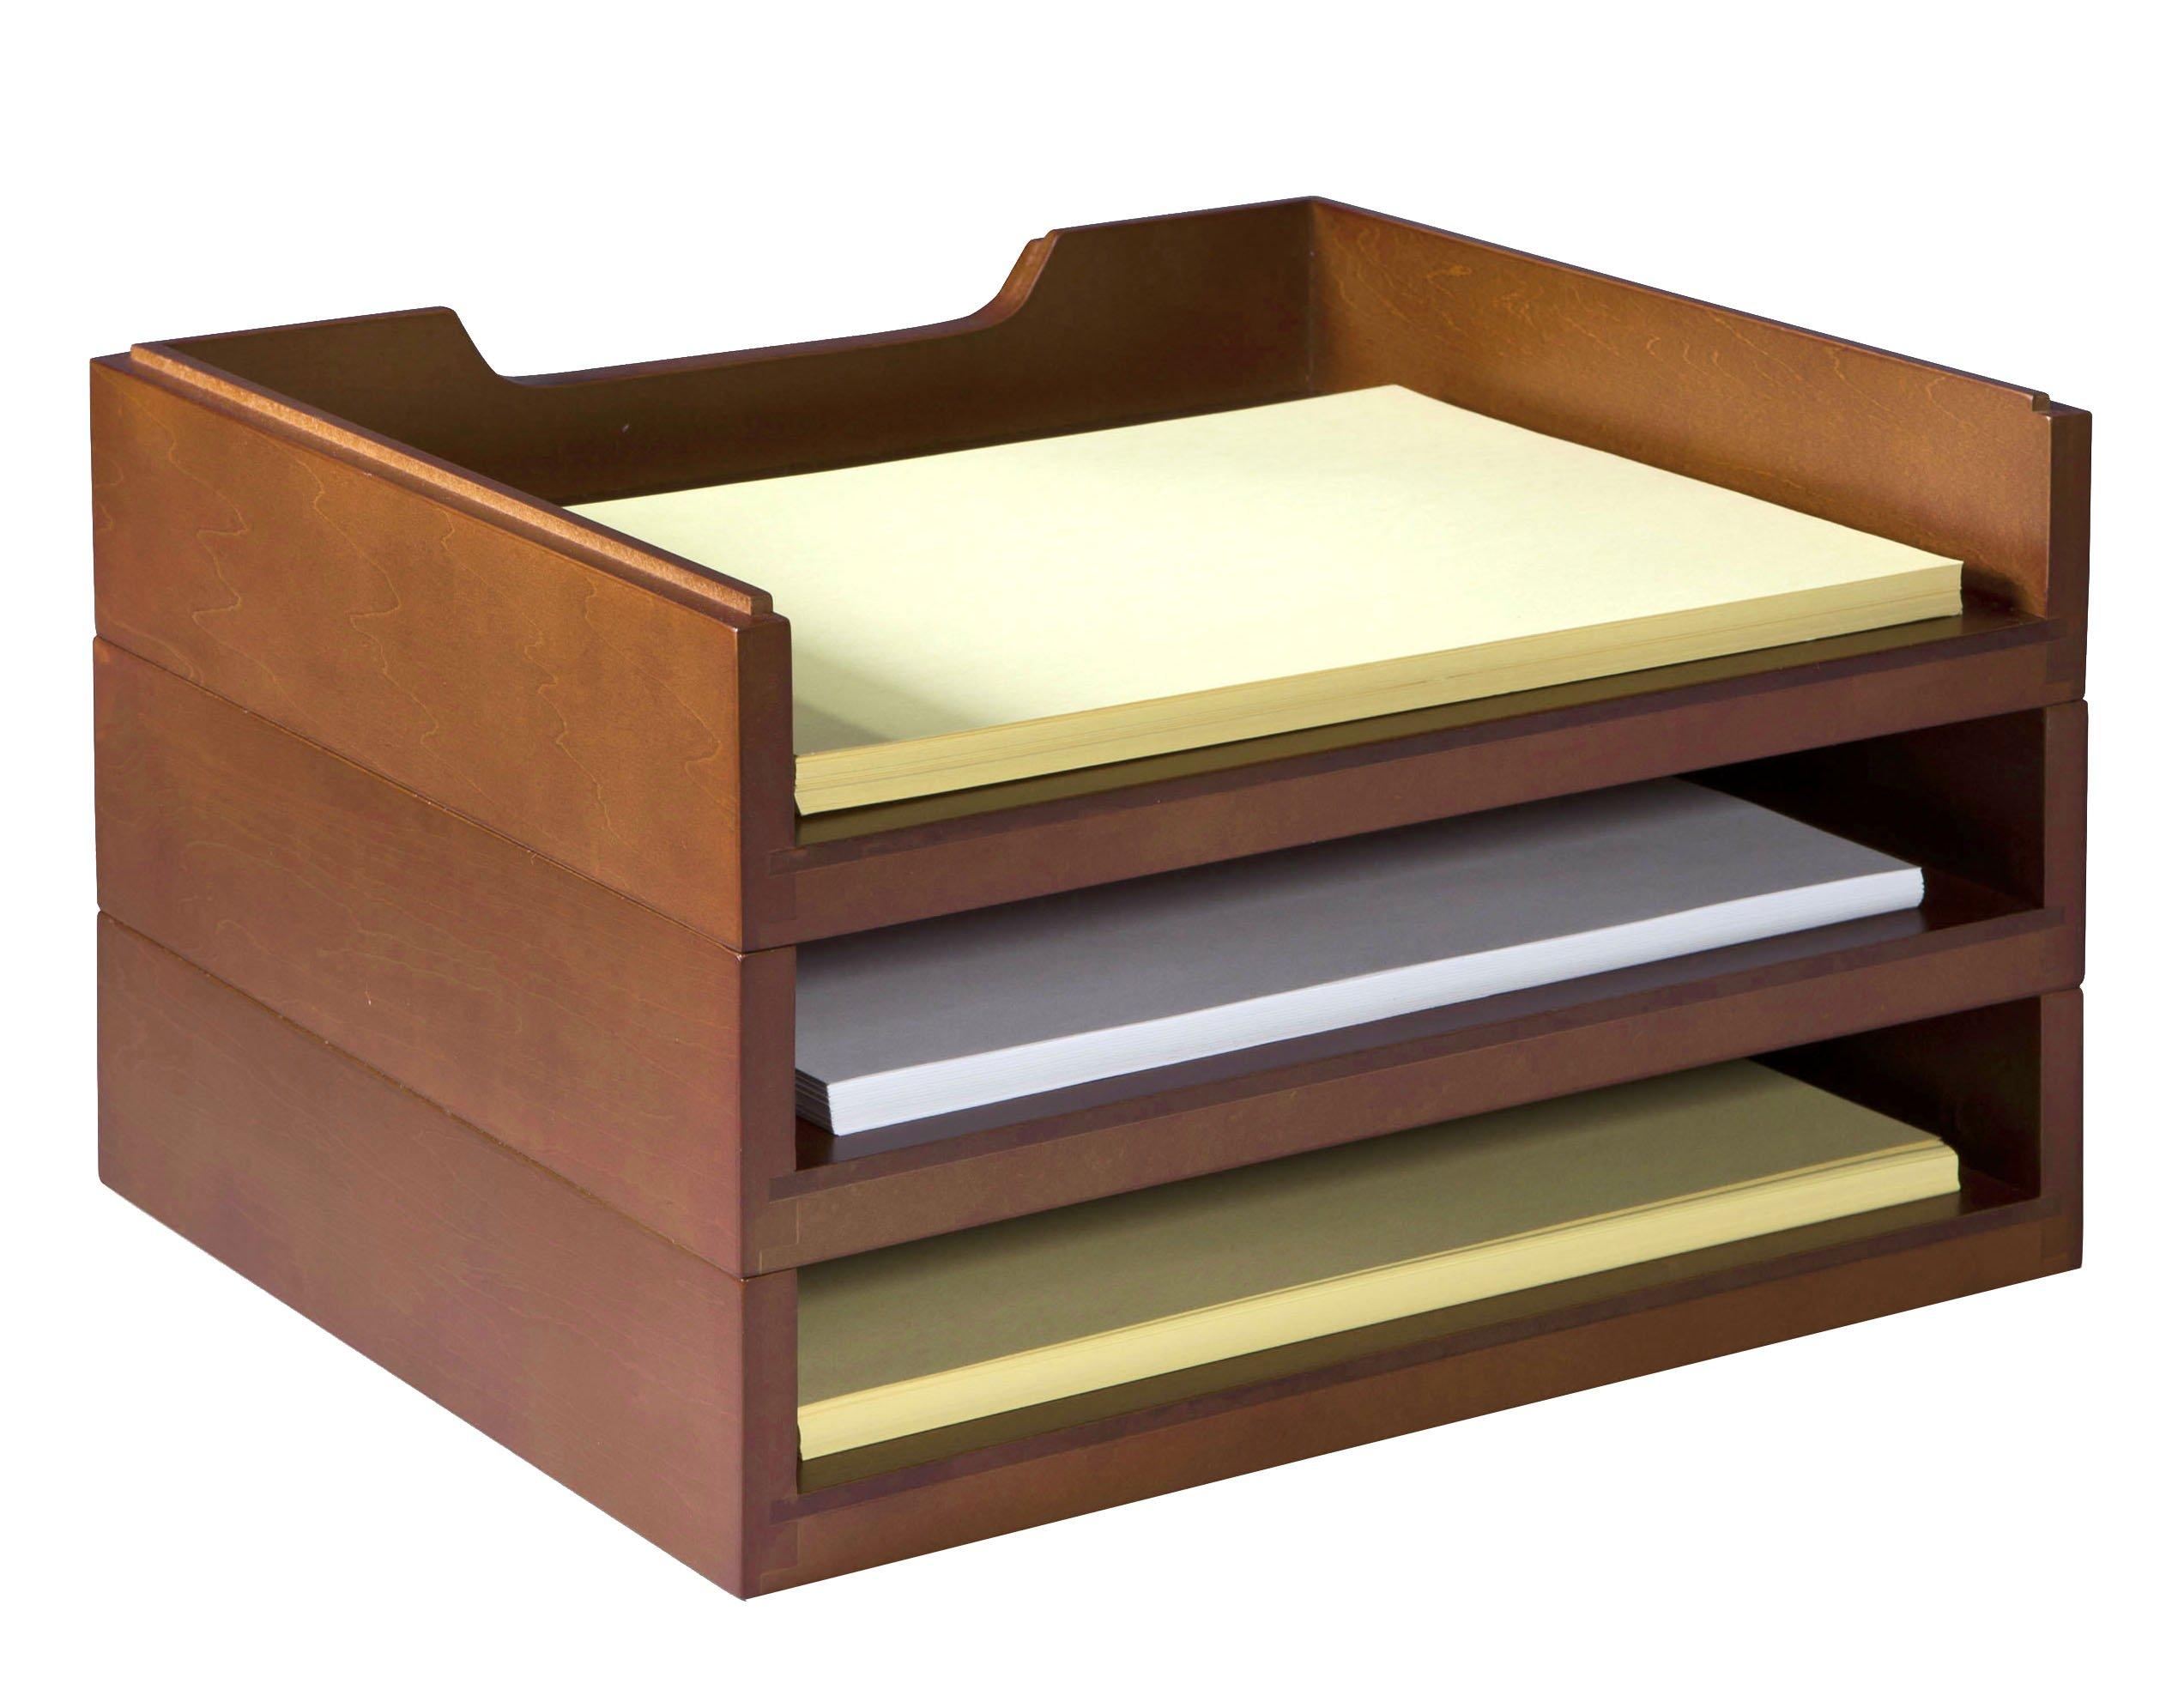 Bindertek Stacking Wood Desk Organizers with 3 Letter Tray Kit, Cherry (WK4-CH) by Bindertek